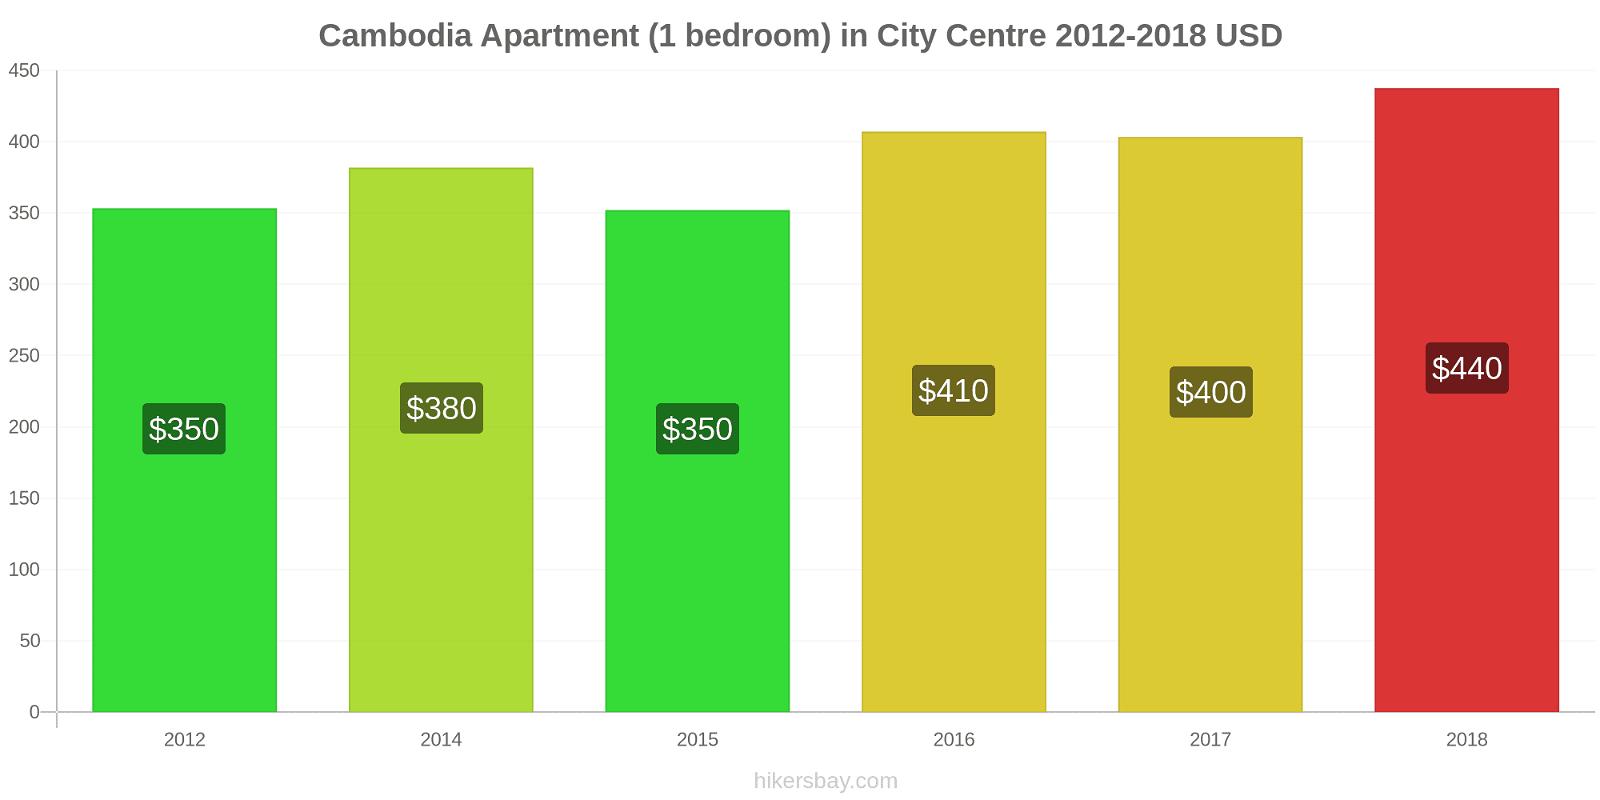 Cambodia price changes Apartment (1 bedroom) in City Centre hikersbay.com